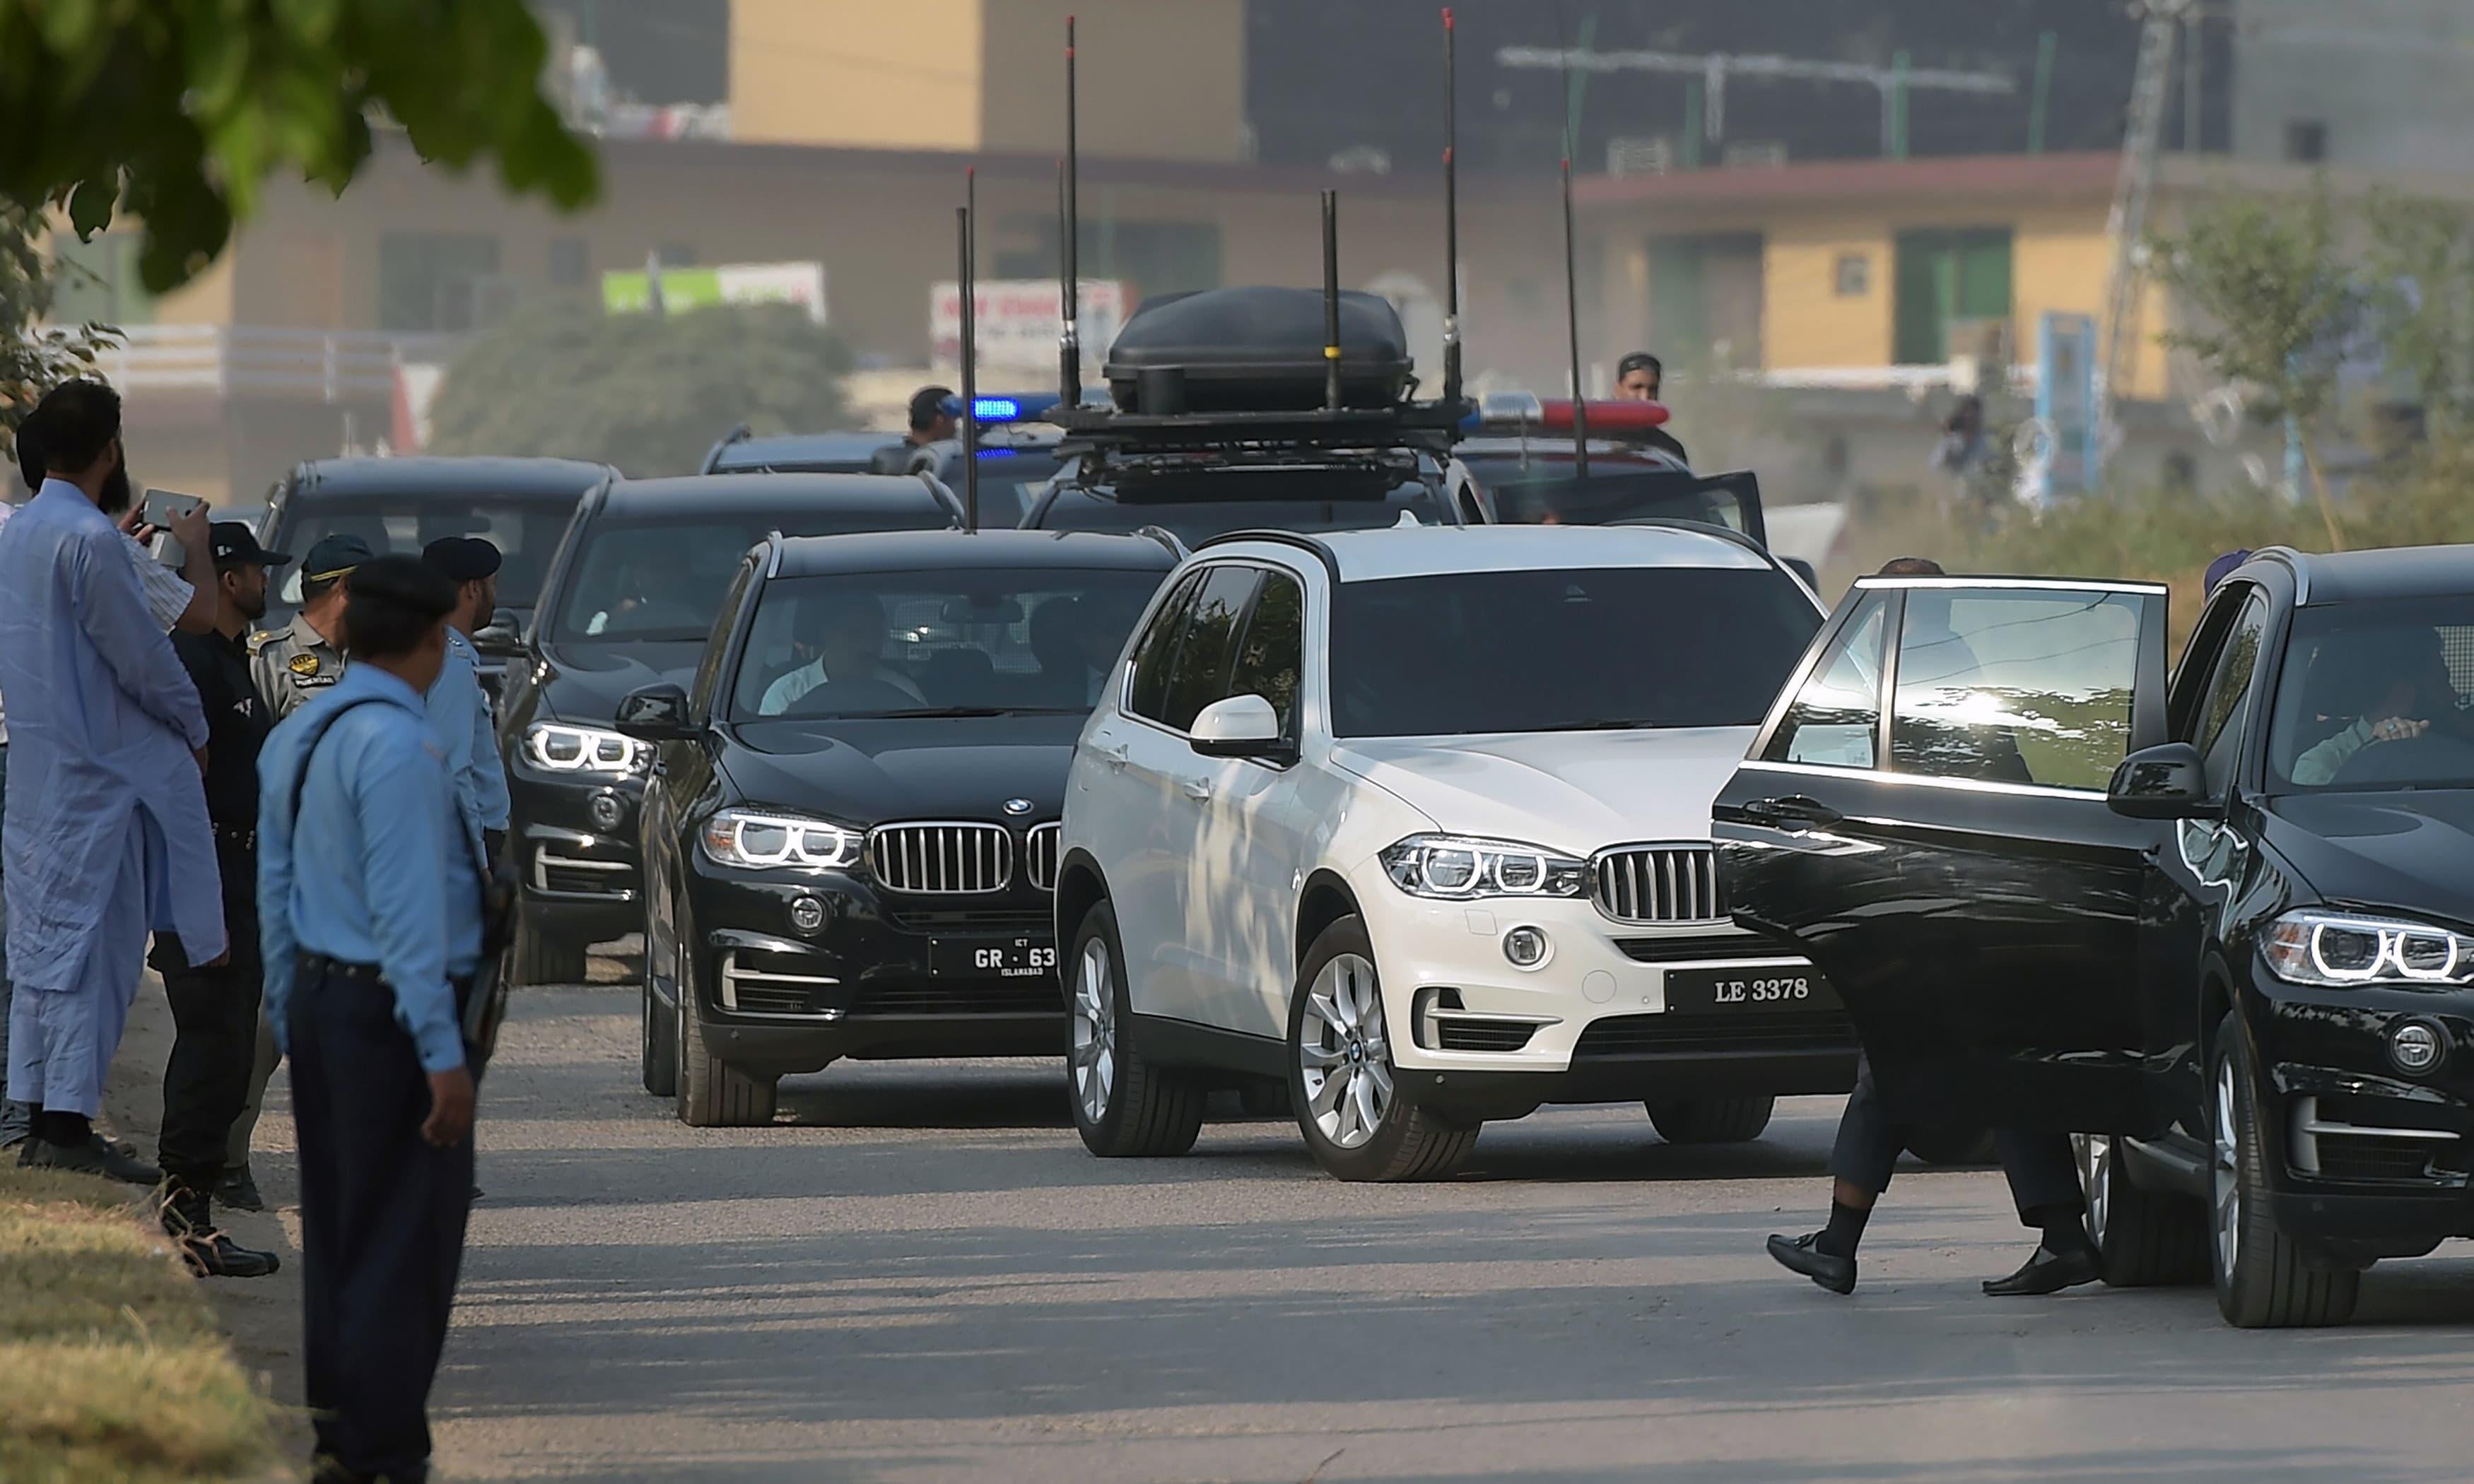 Security vehicles escort a white car carrying Nawaz Sharif. —AFP